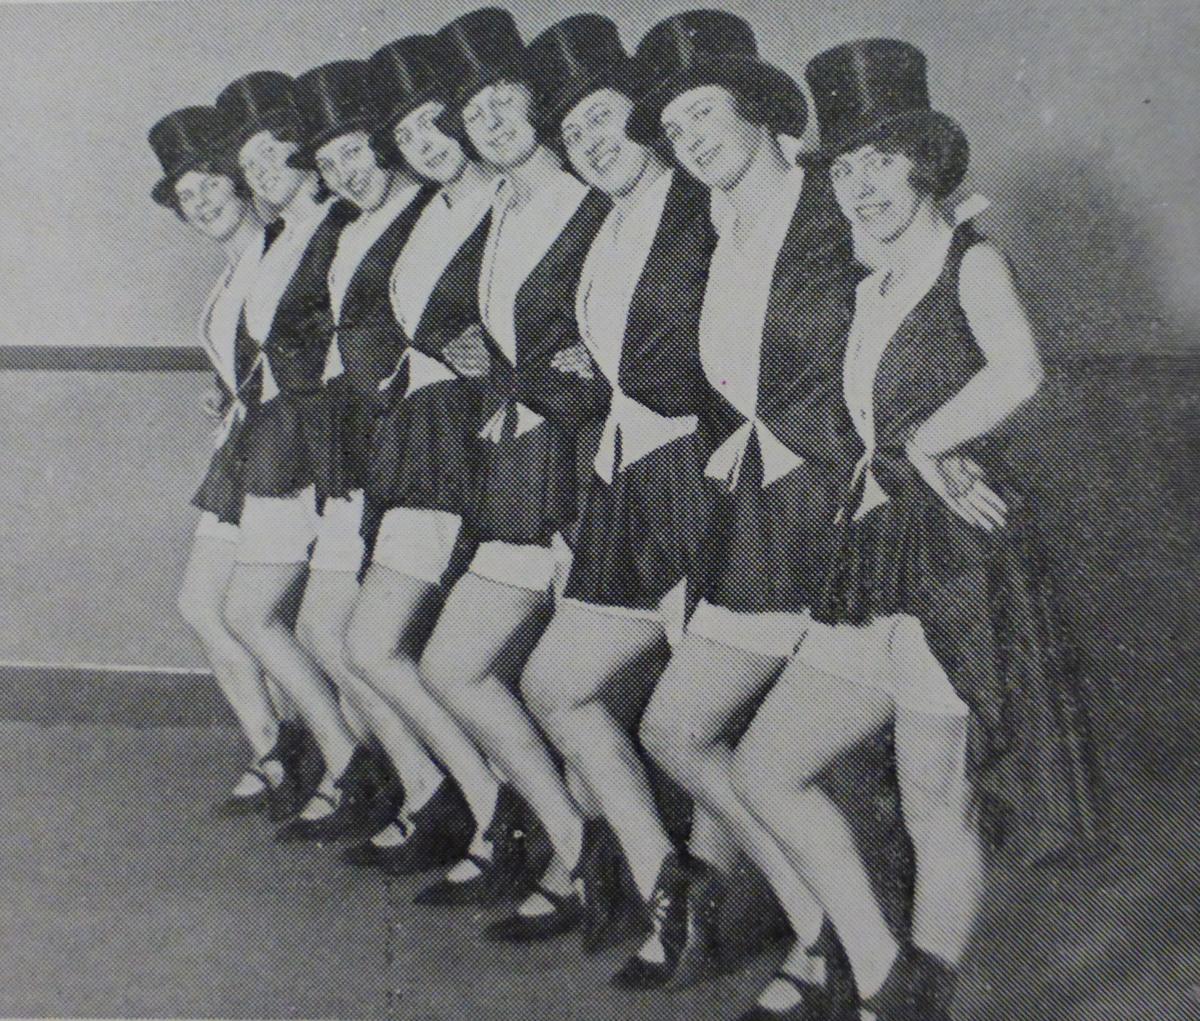 Northern Lights, 1929, chorus girls